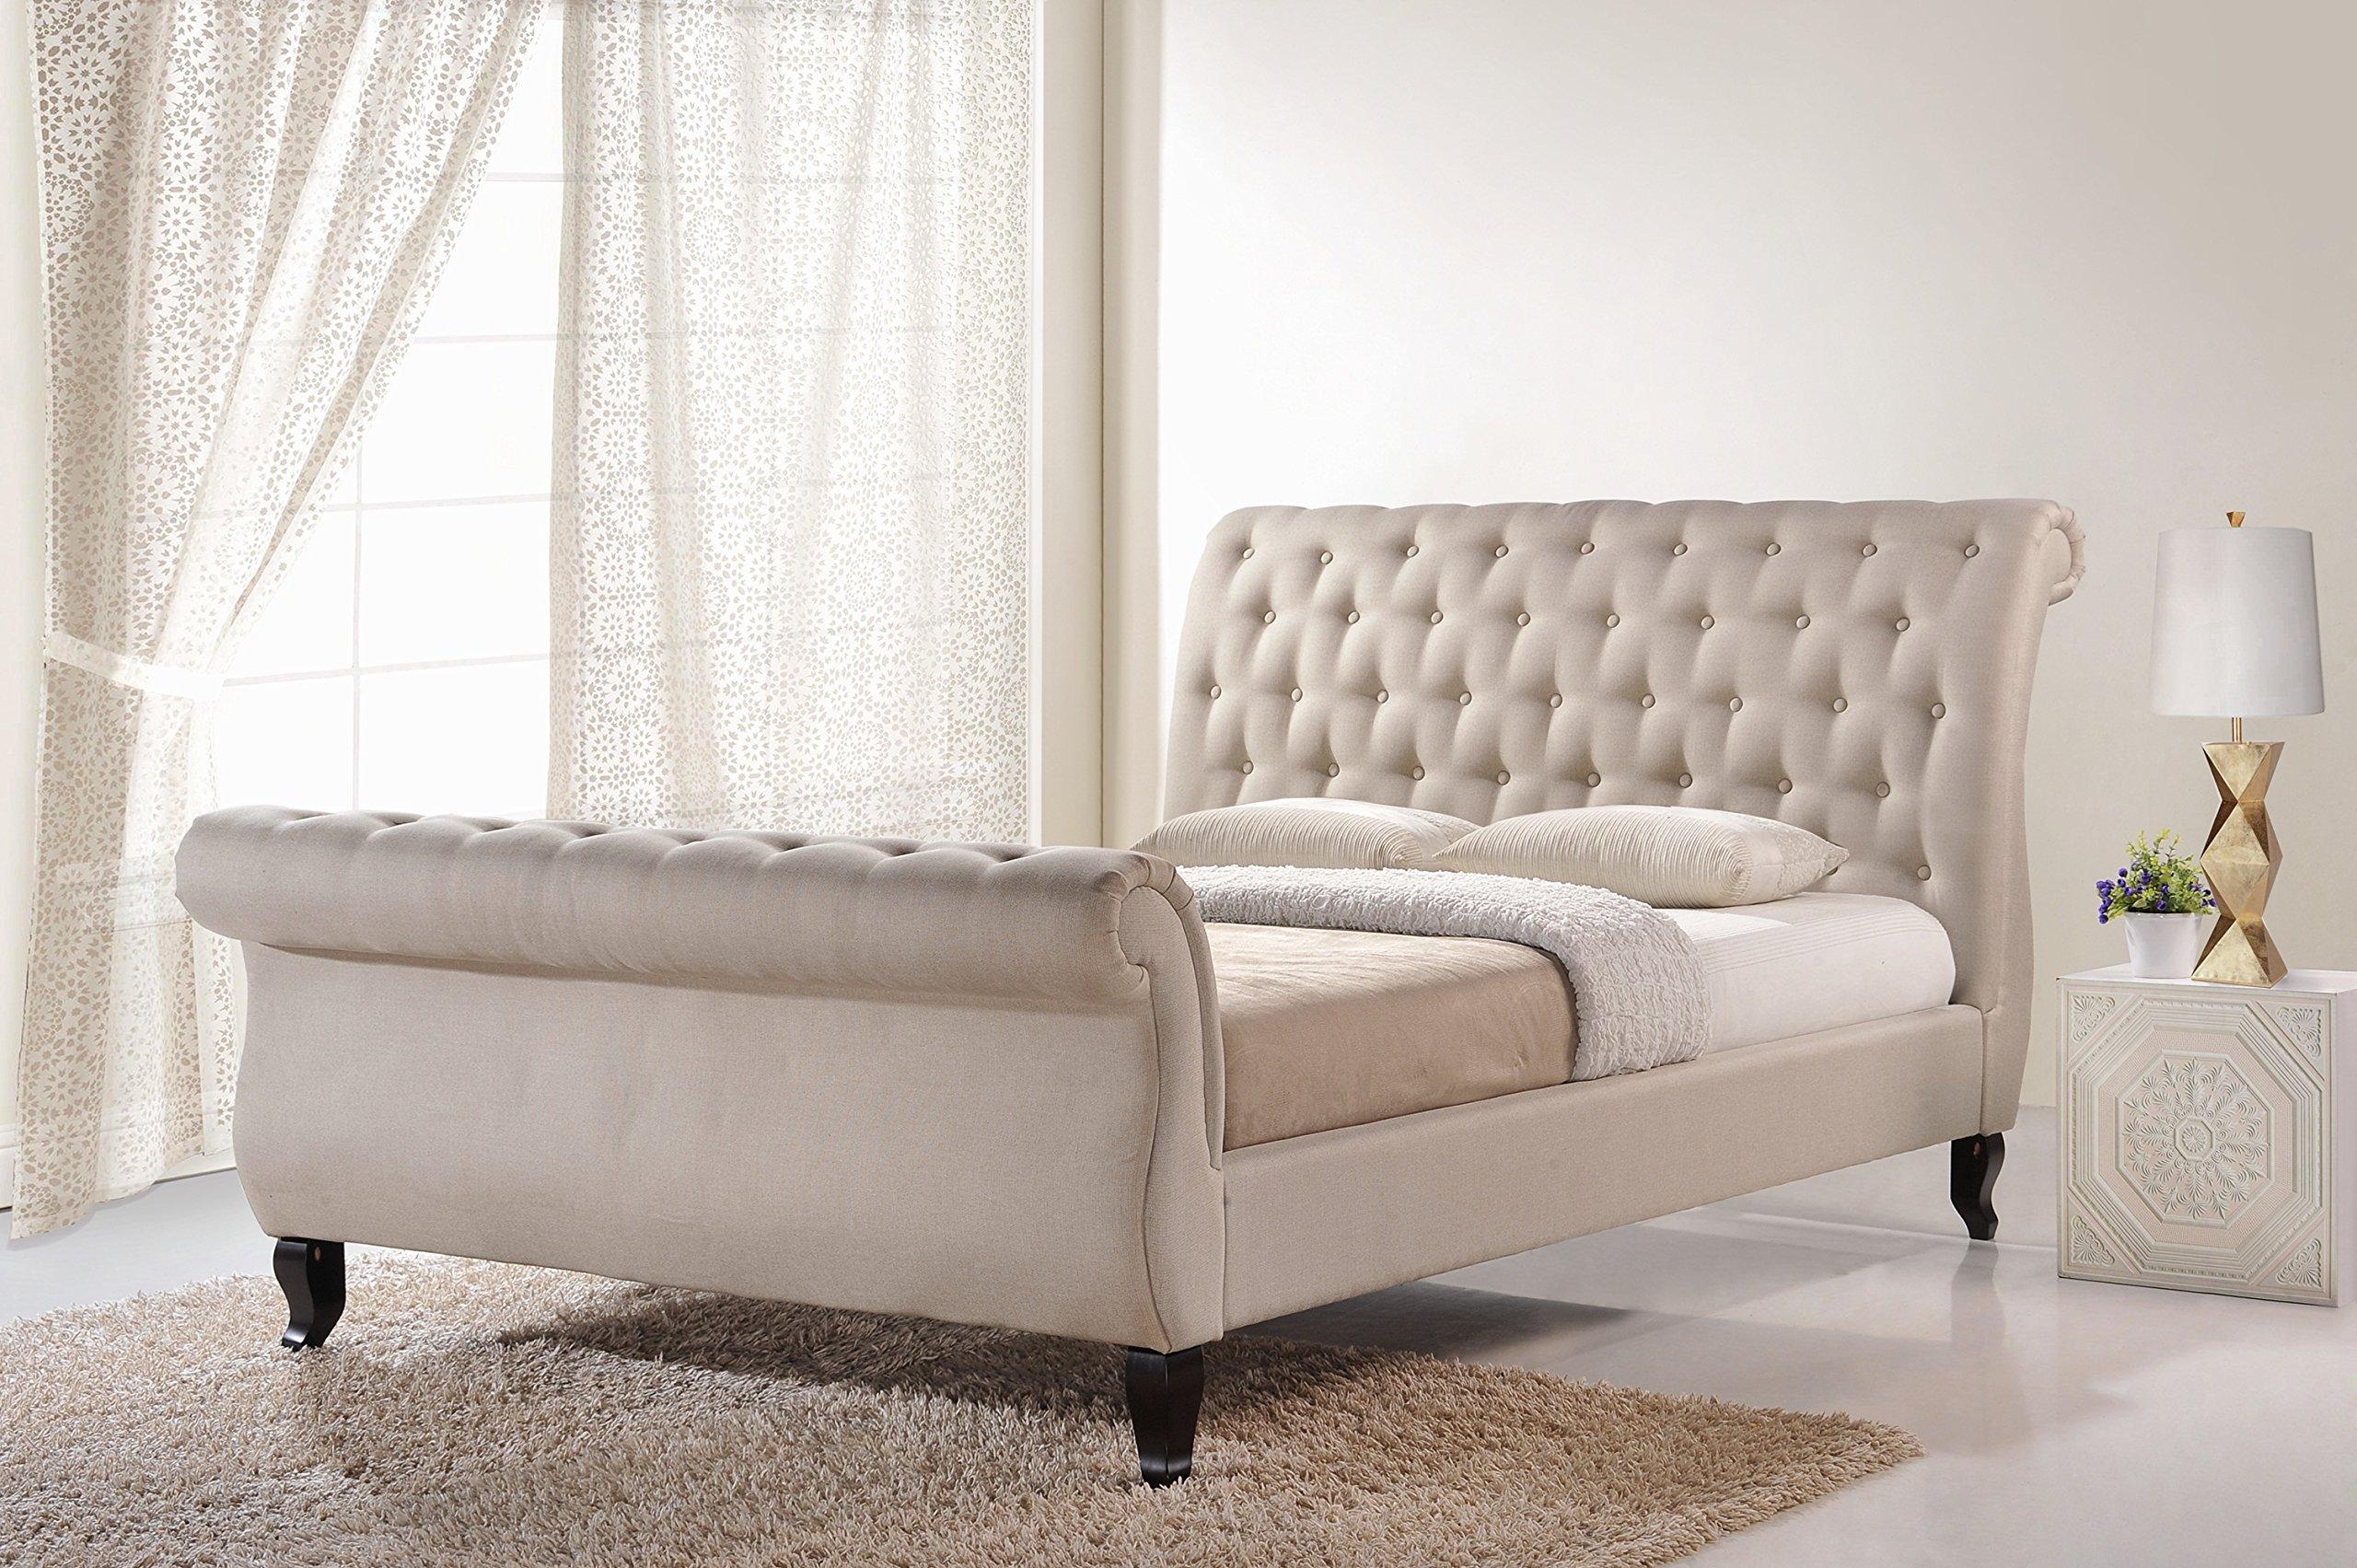 Baxton Studio Arran Linen Platform Bed